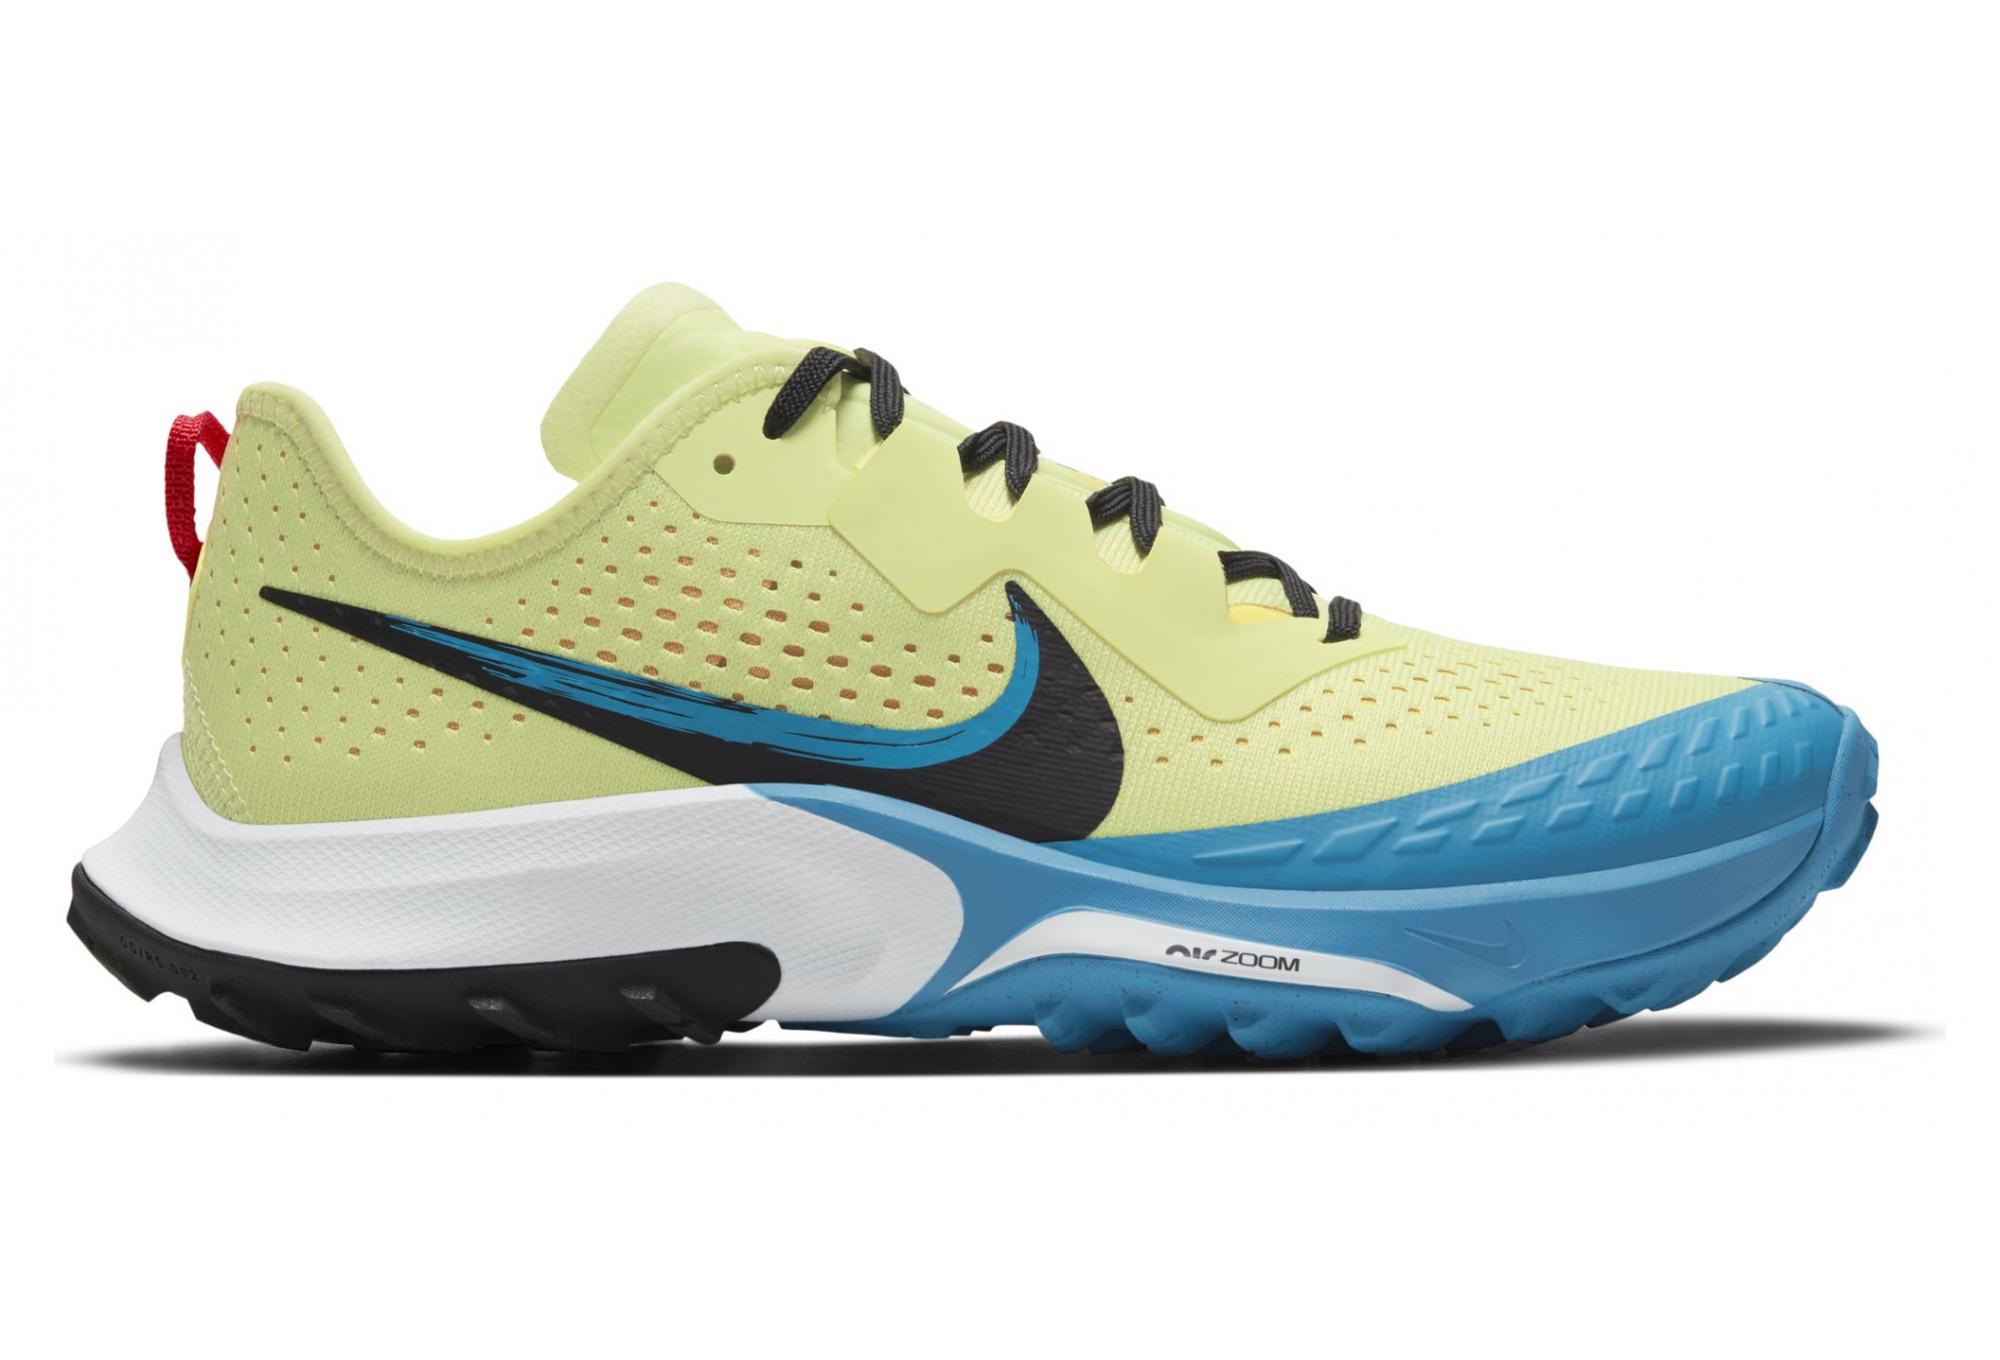 Chaussures de Trail Femme Nike Air Zoom Terra Kiger 7 Jaune / Bleu